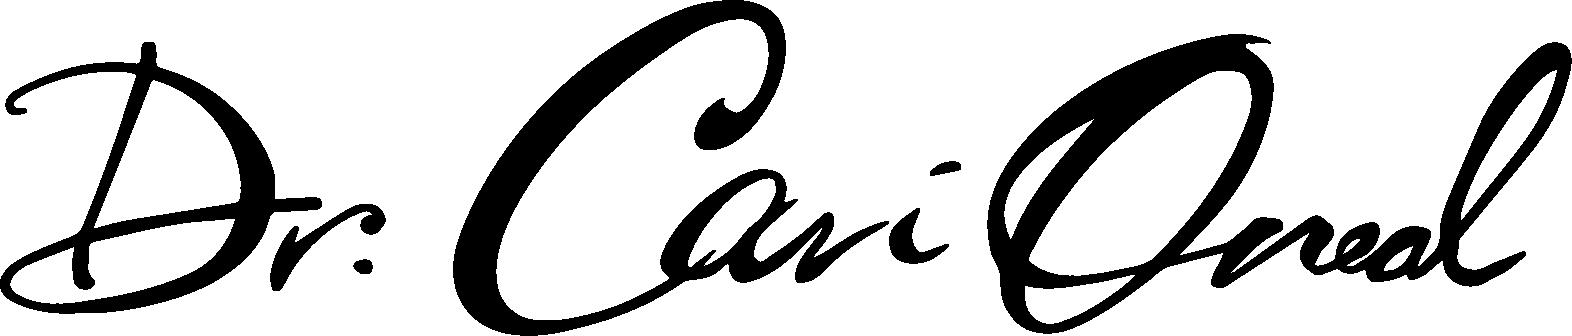 Logo- new colors-black